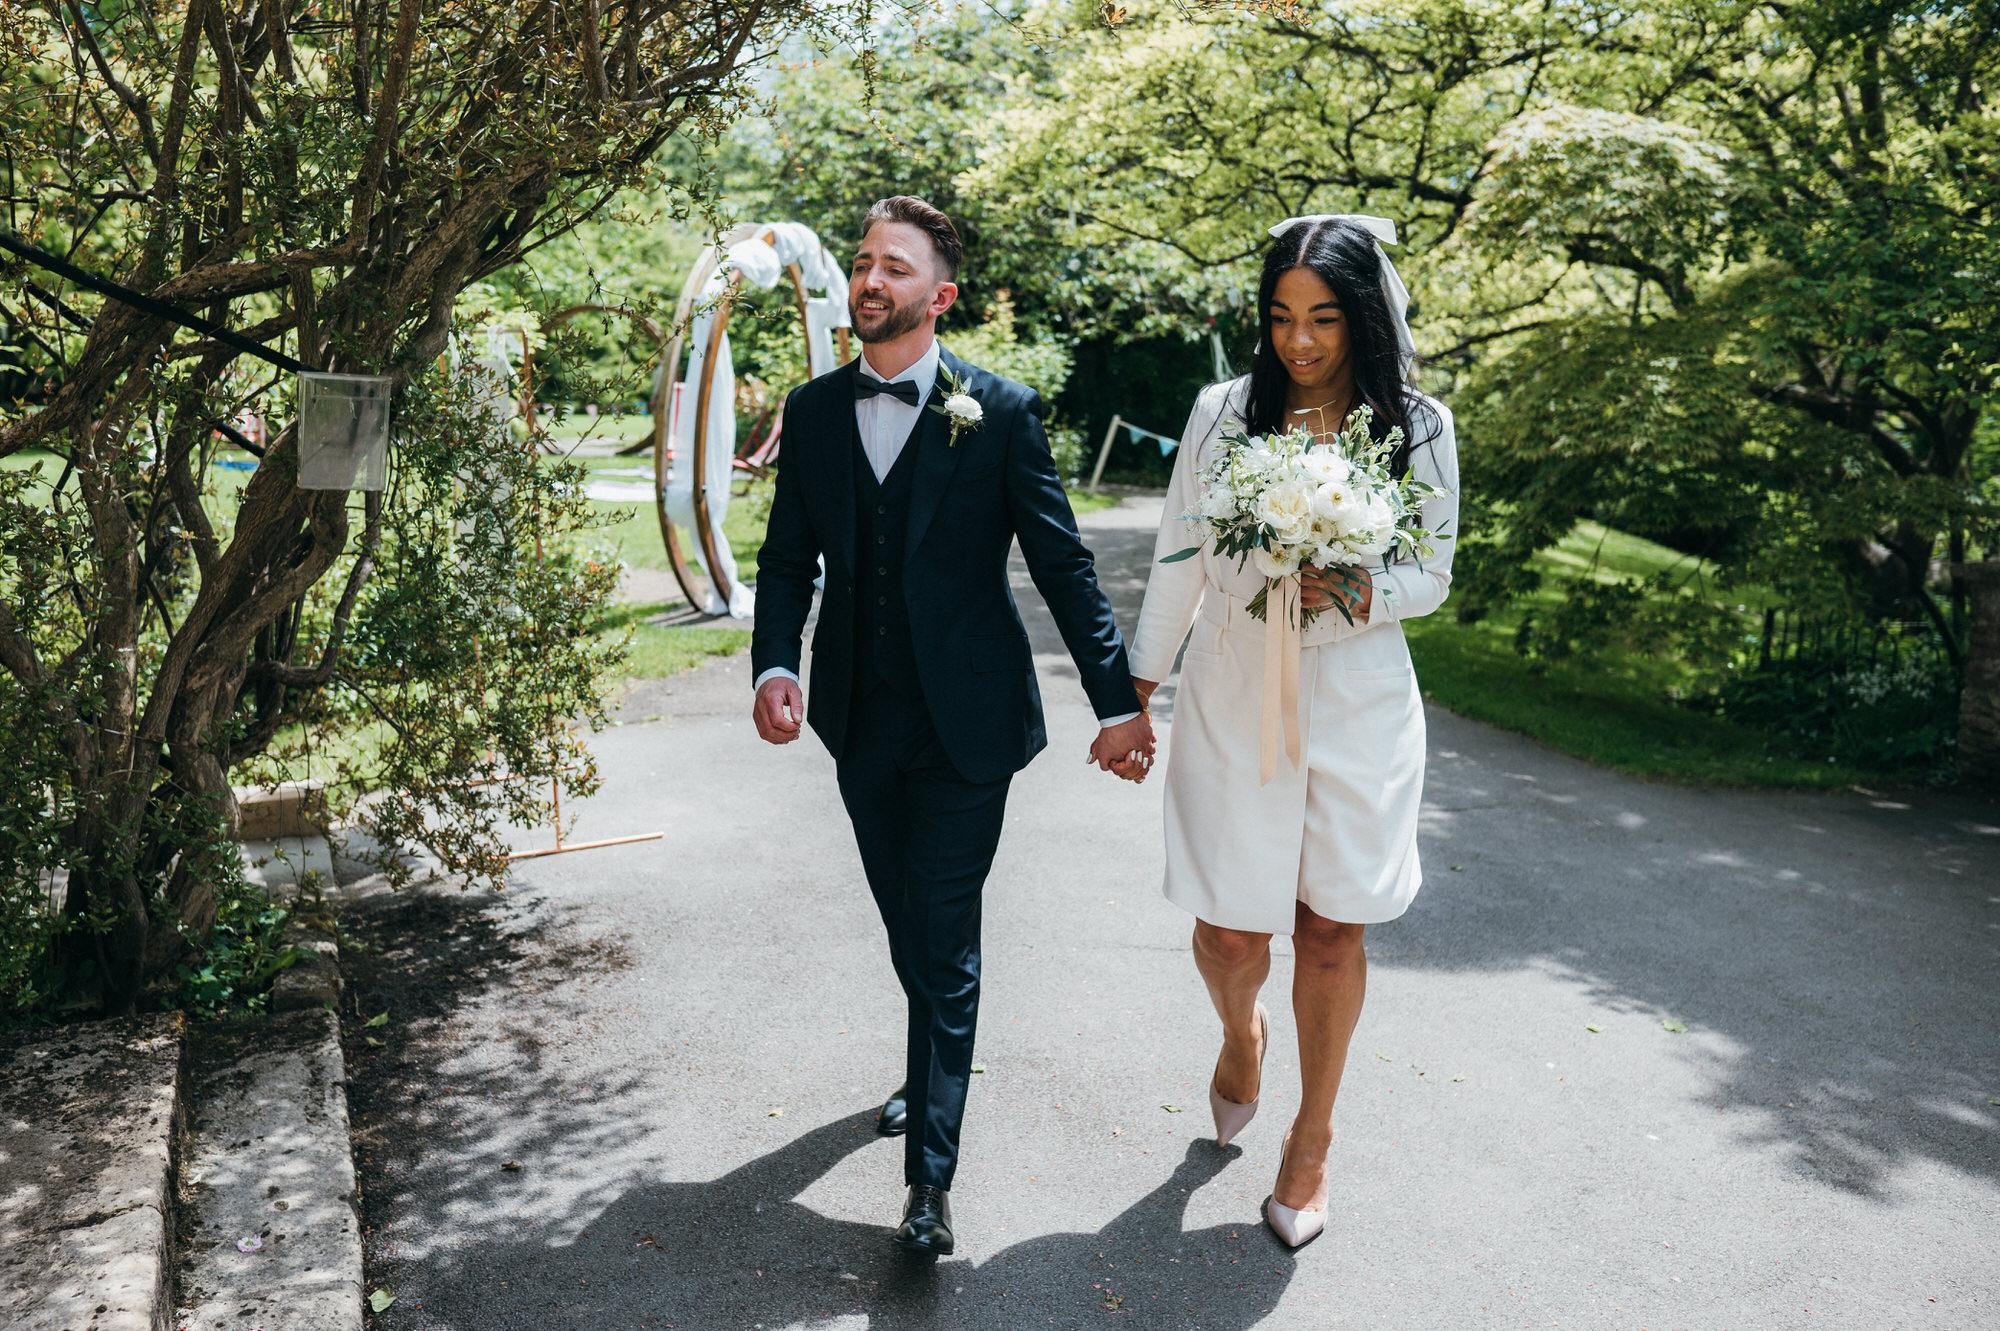 Intimate wedding botanical gardens bath 6